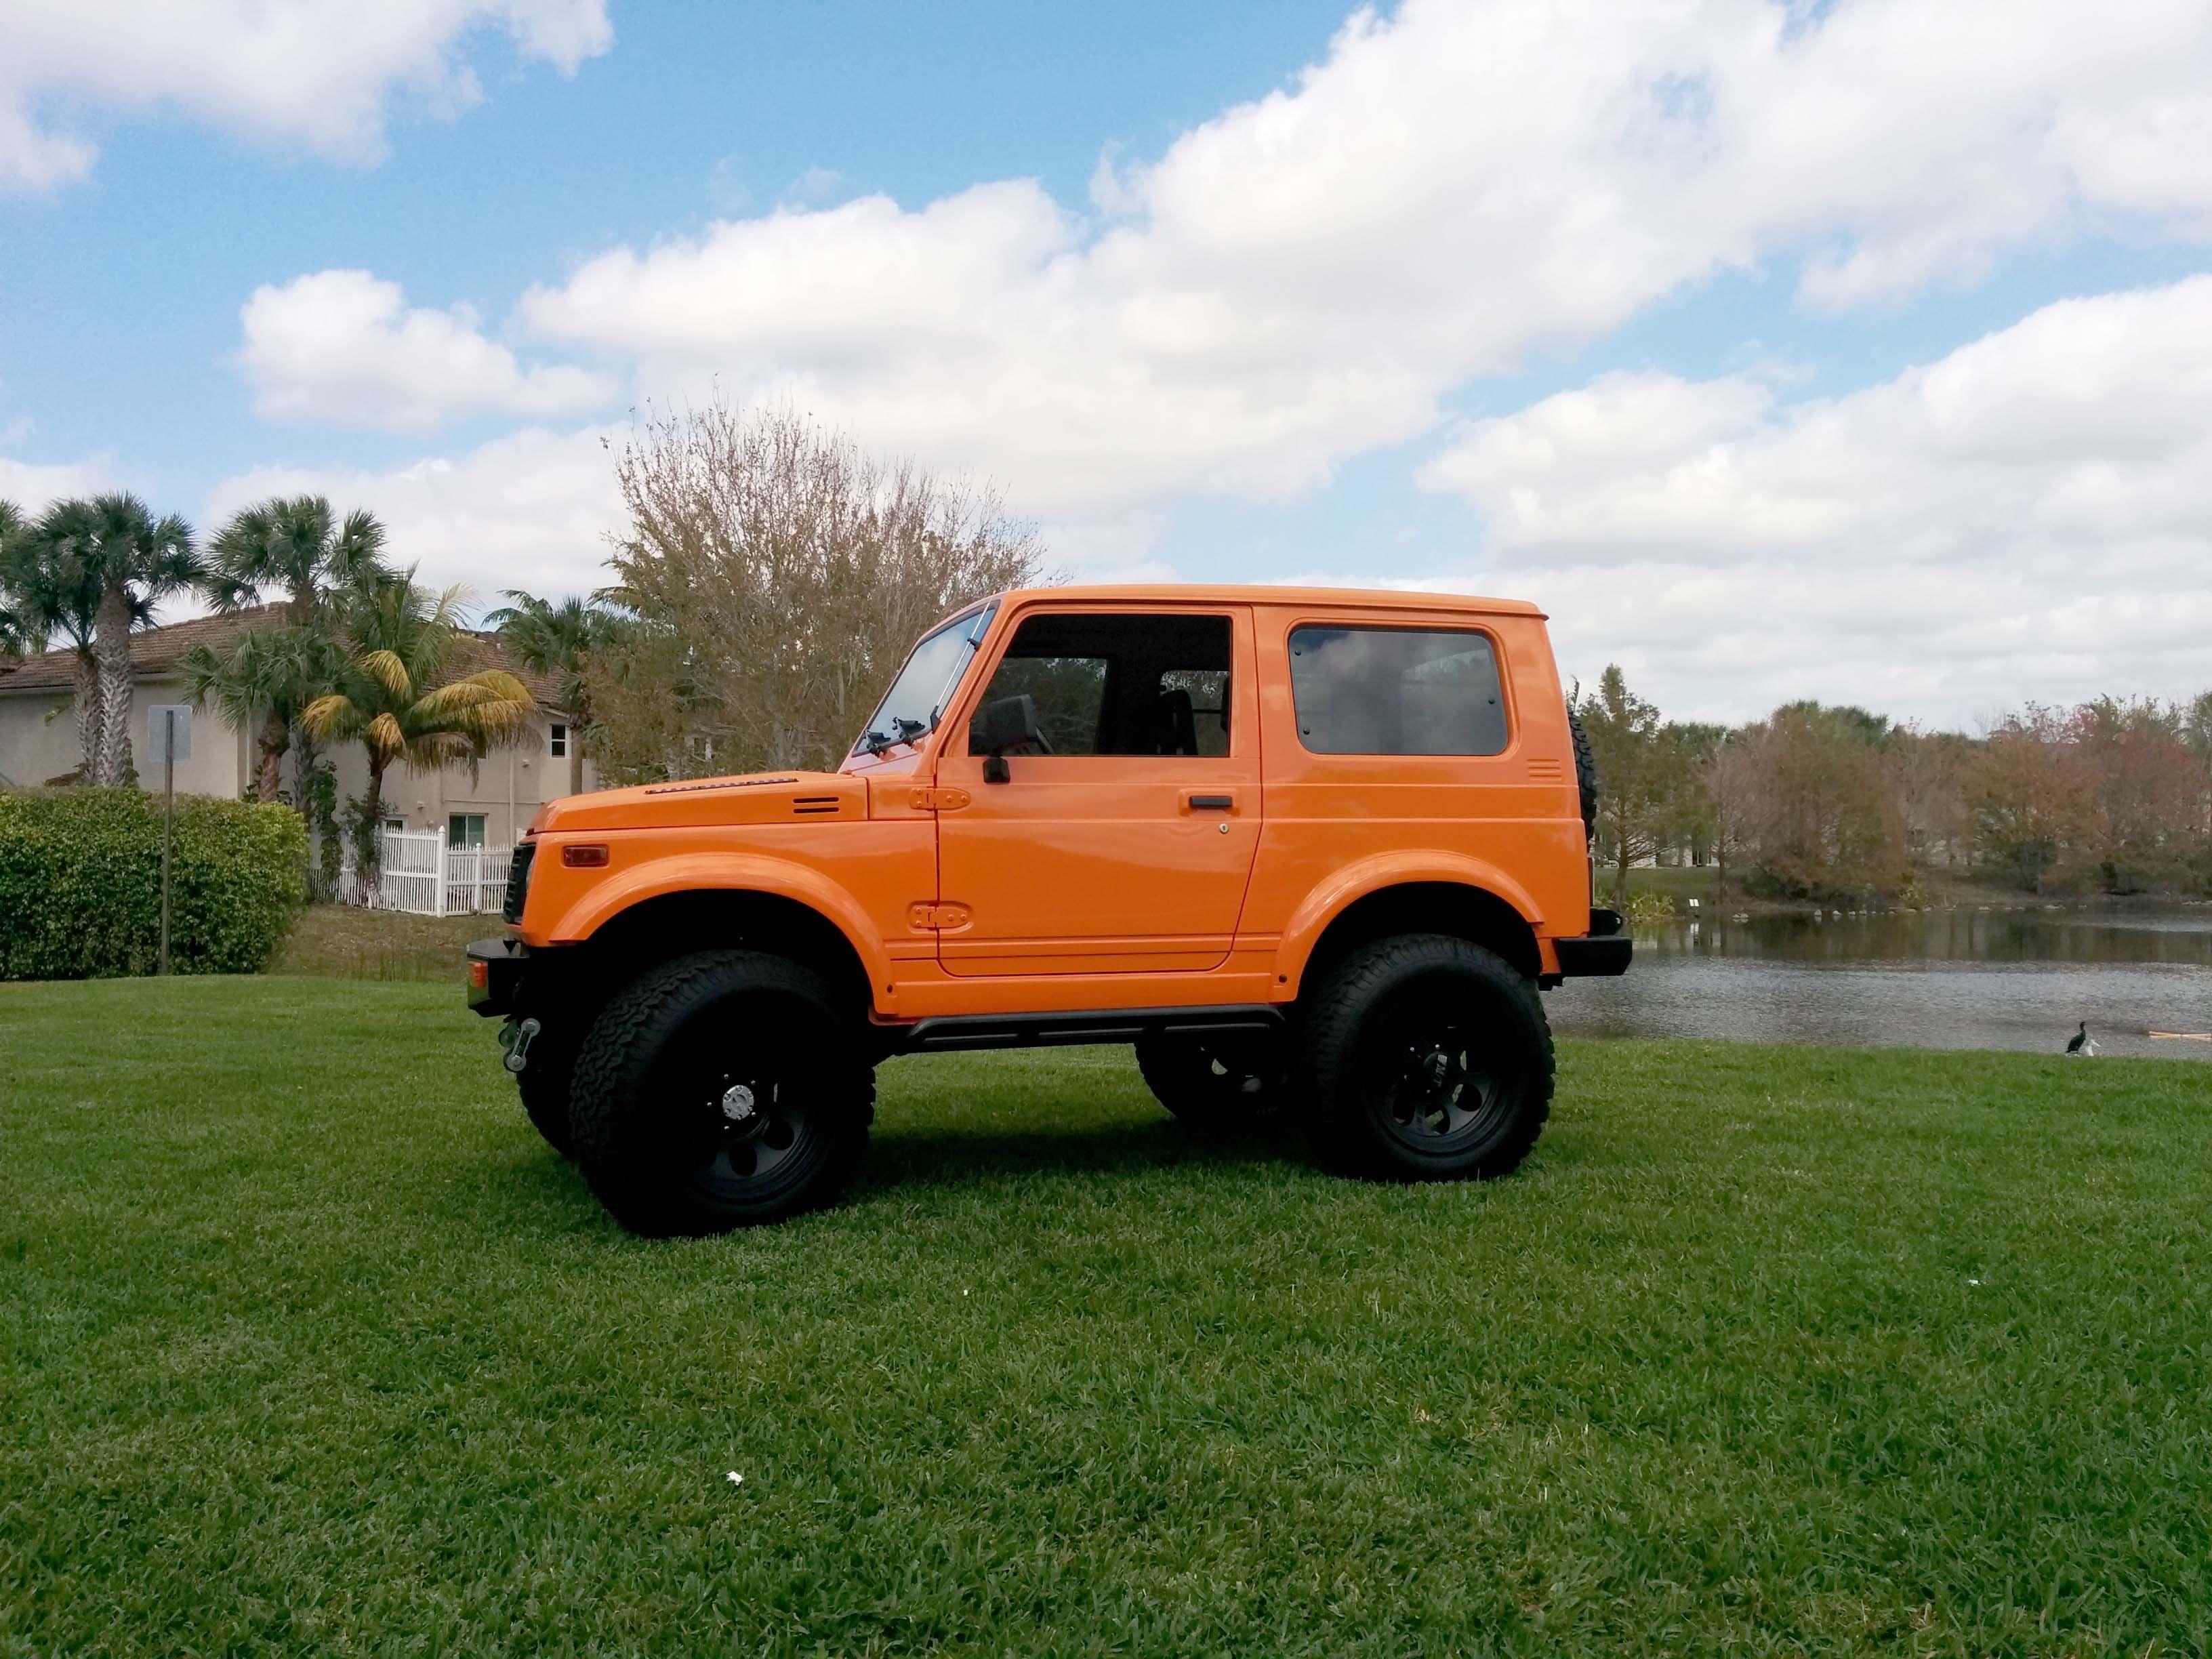 Orange Suzuki Samurai | Suzuki Samurai | Pinterest | Jeeps  Orange Suzuki S...